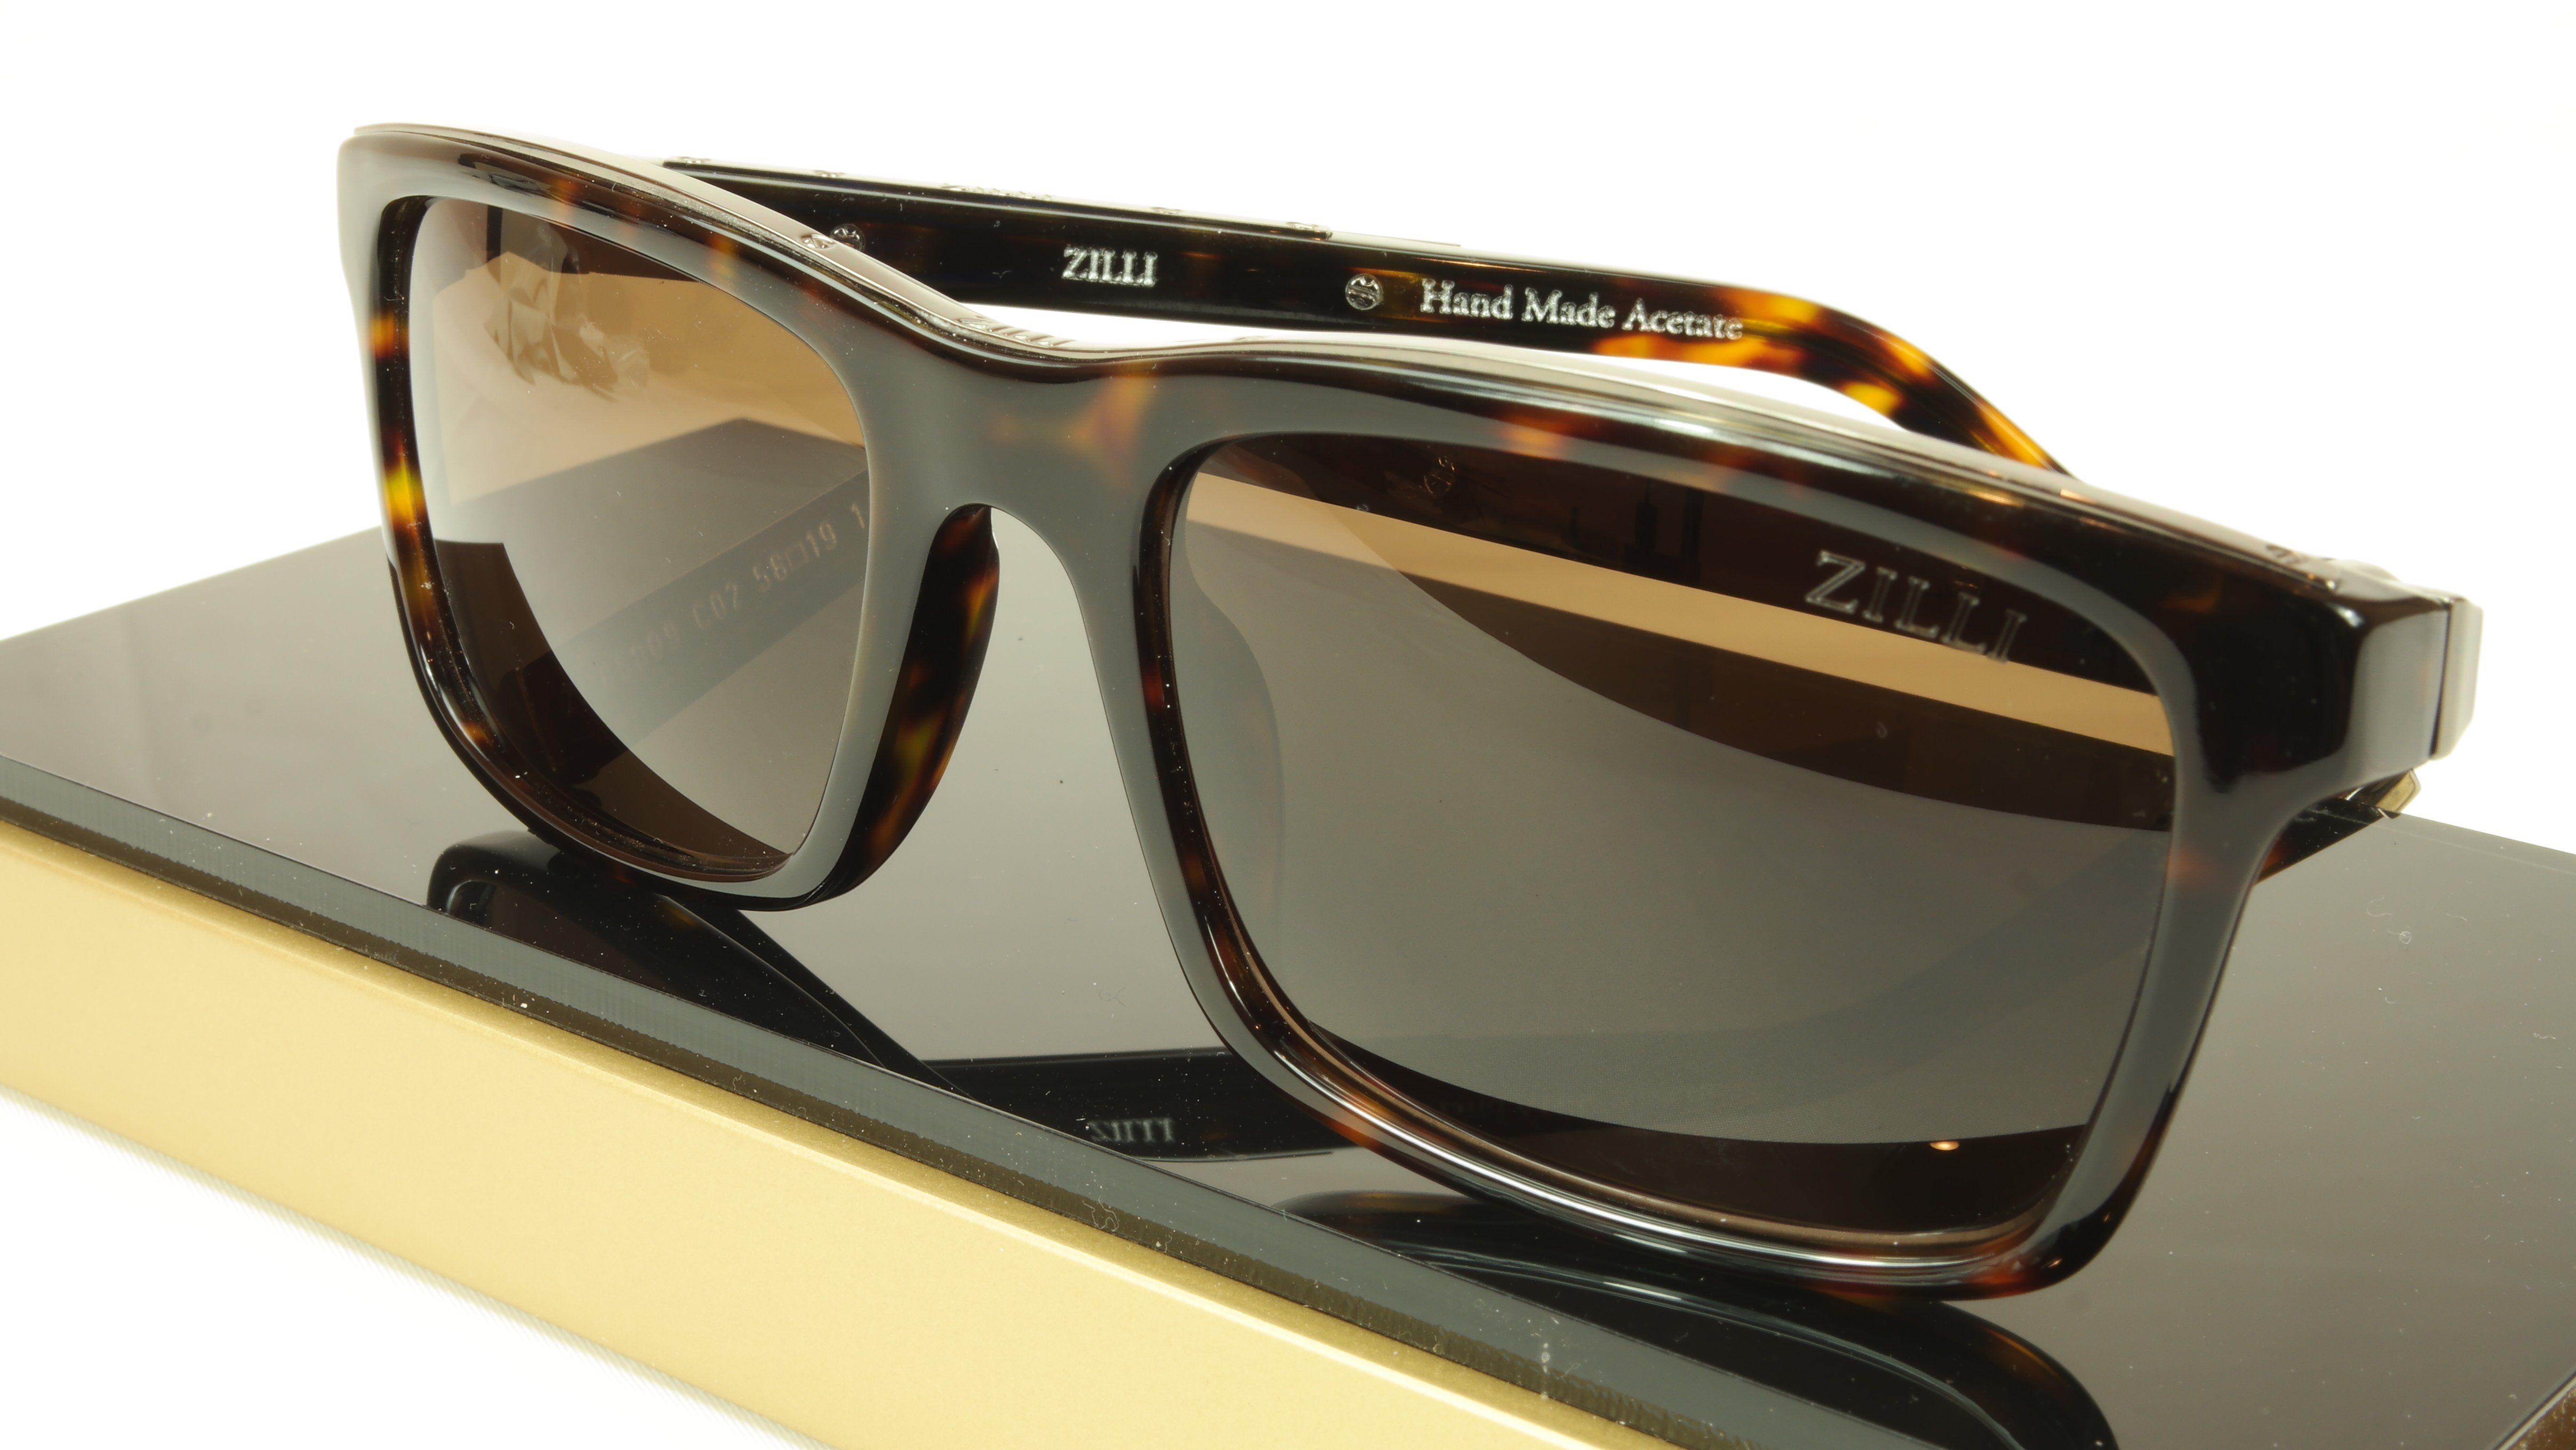 37f0ab5737 ZILLI Sunglasses Polarized Hand Made Acetate Titanium France ZI 65009 C02  101